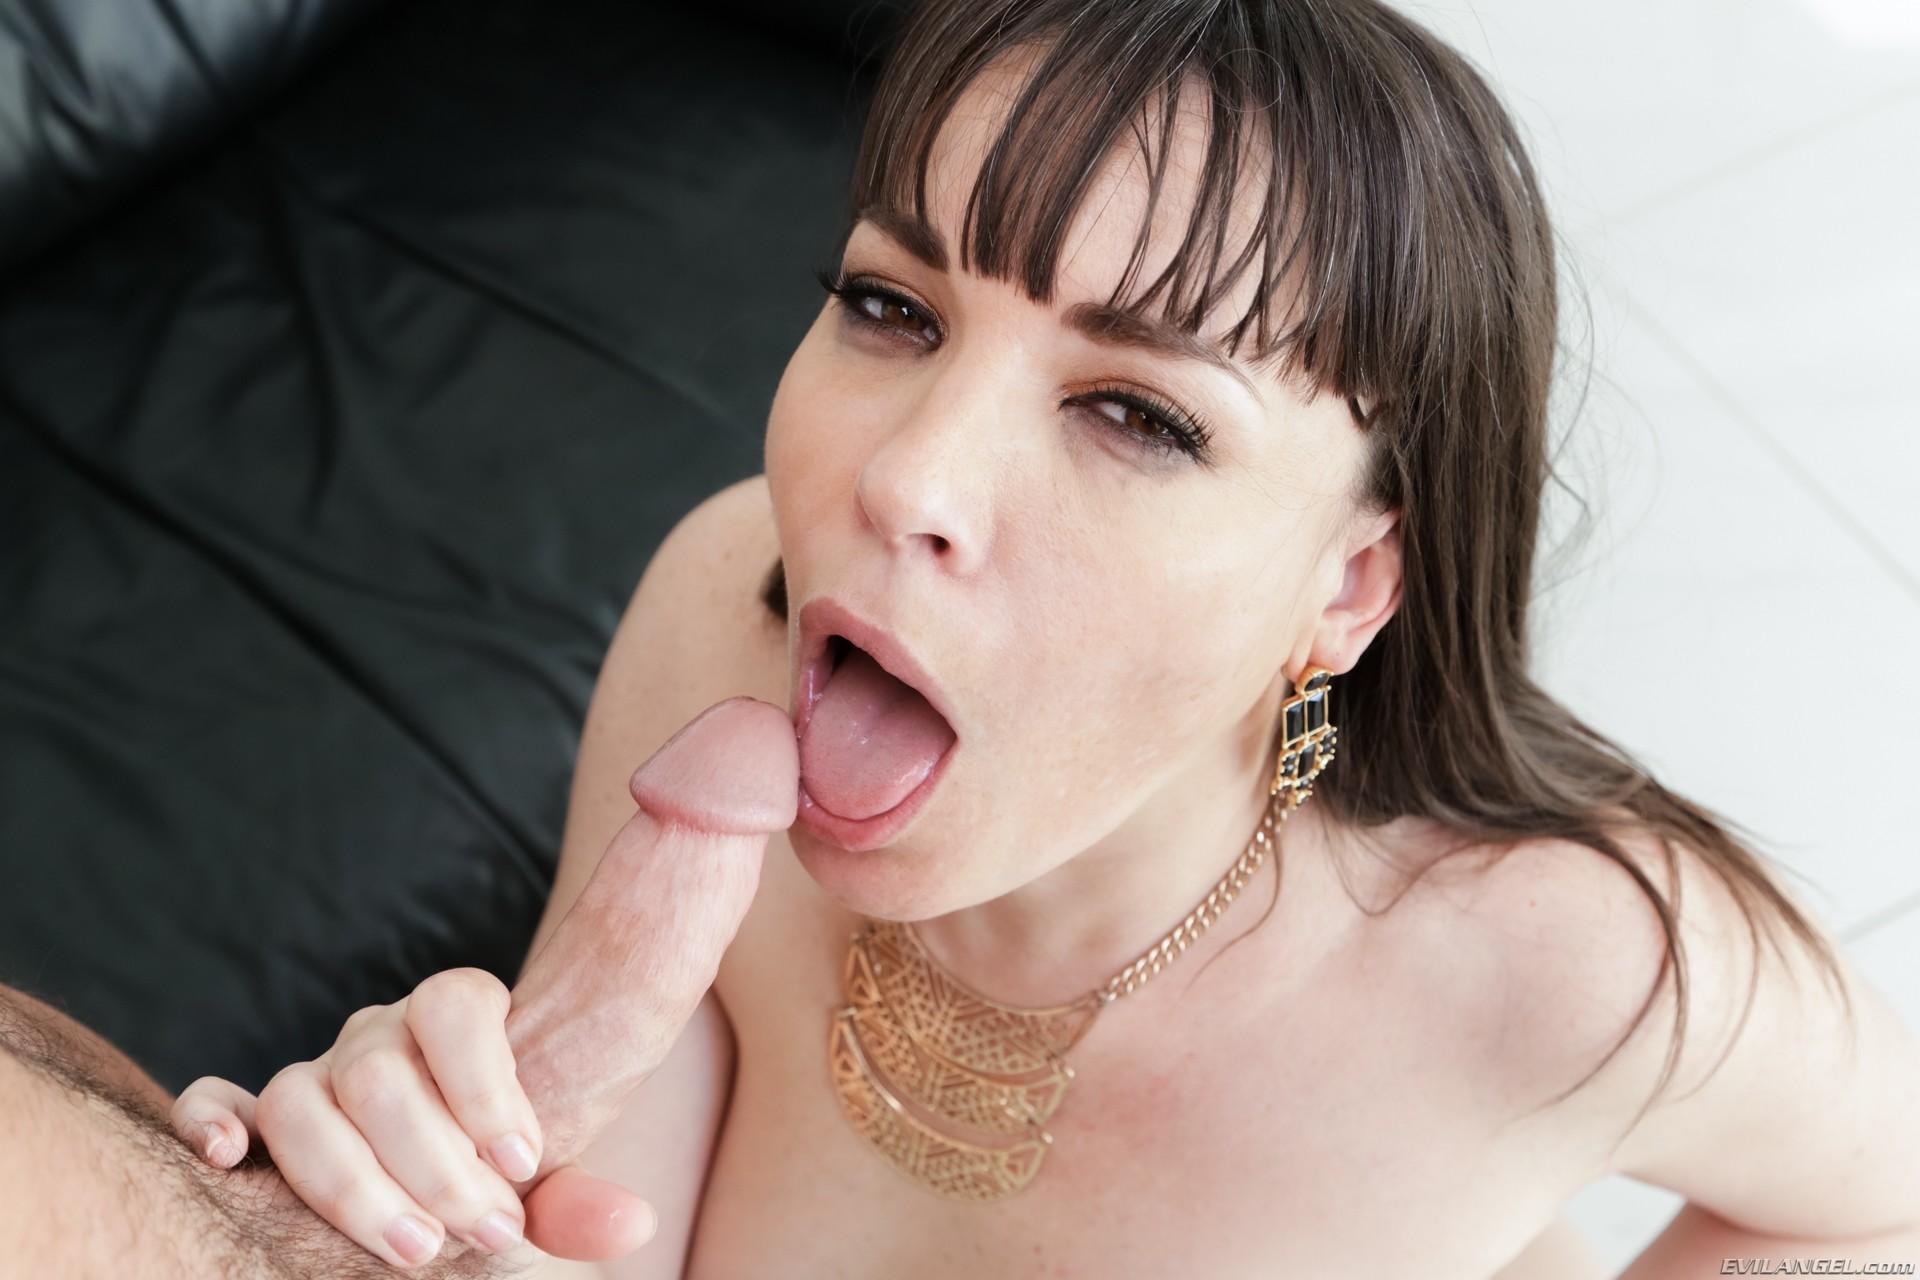 clip free hermaphrodite pissing